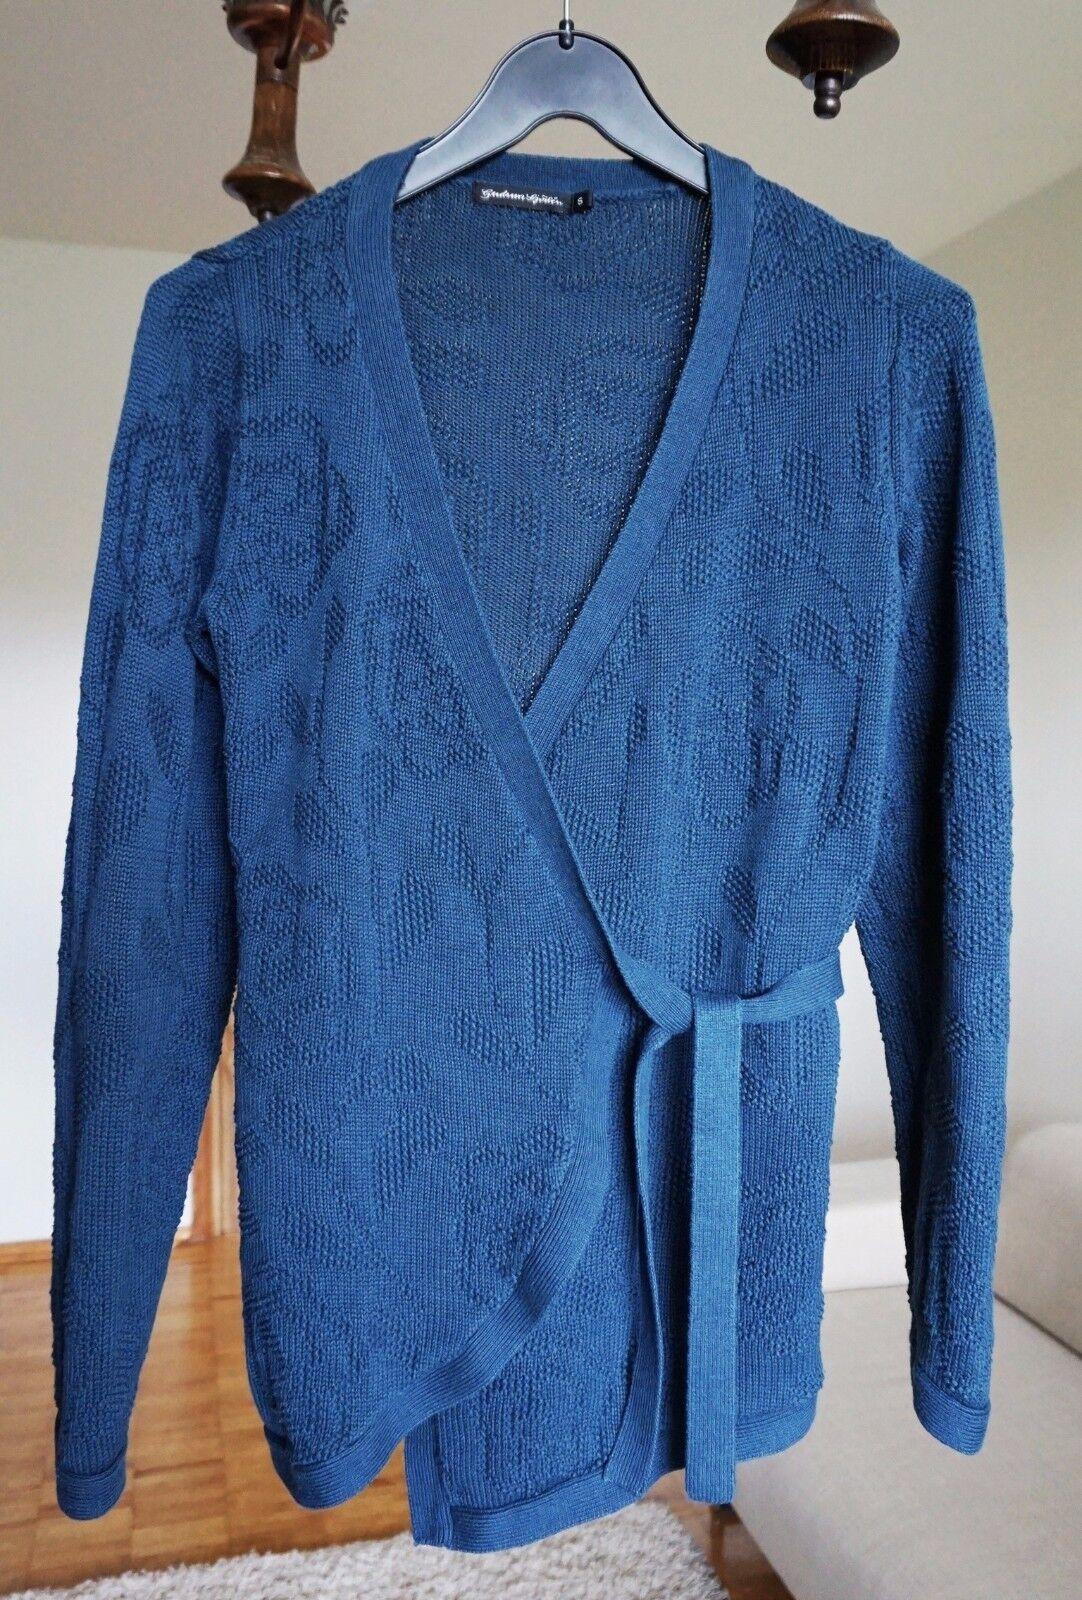 GUDRUN SJODEN Long Sleeve WOOL+Cotton Blend Tie-Up Wrap Sweater Cardigan size S